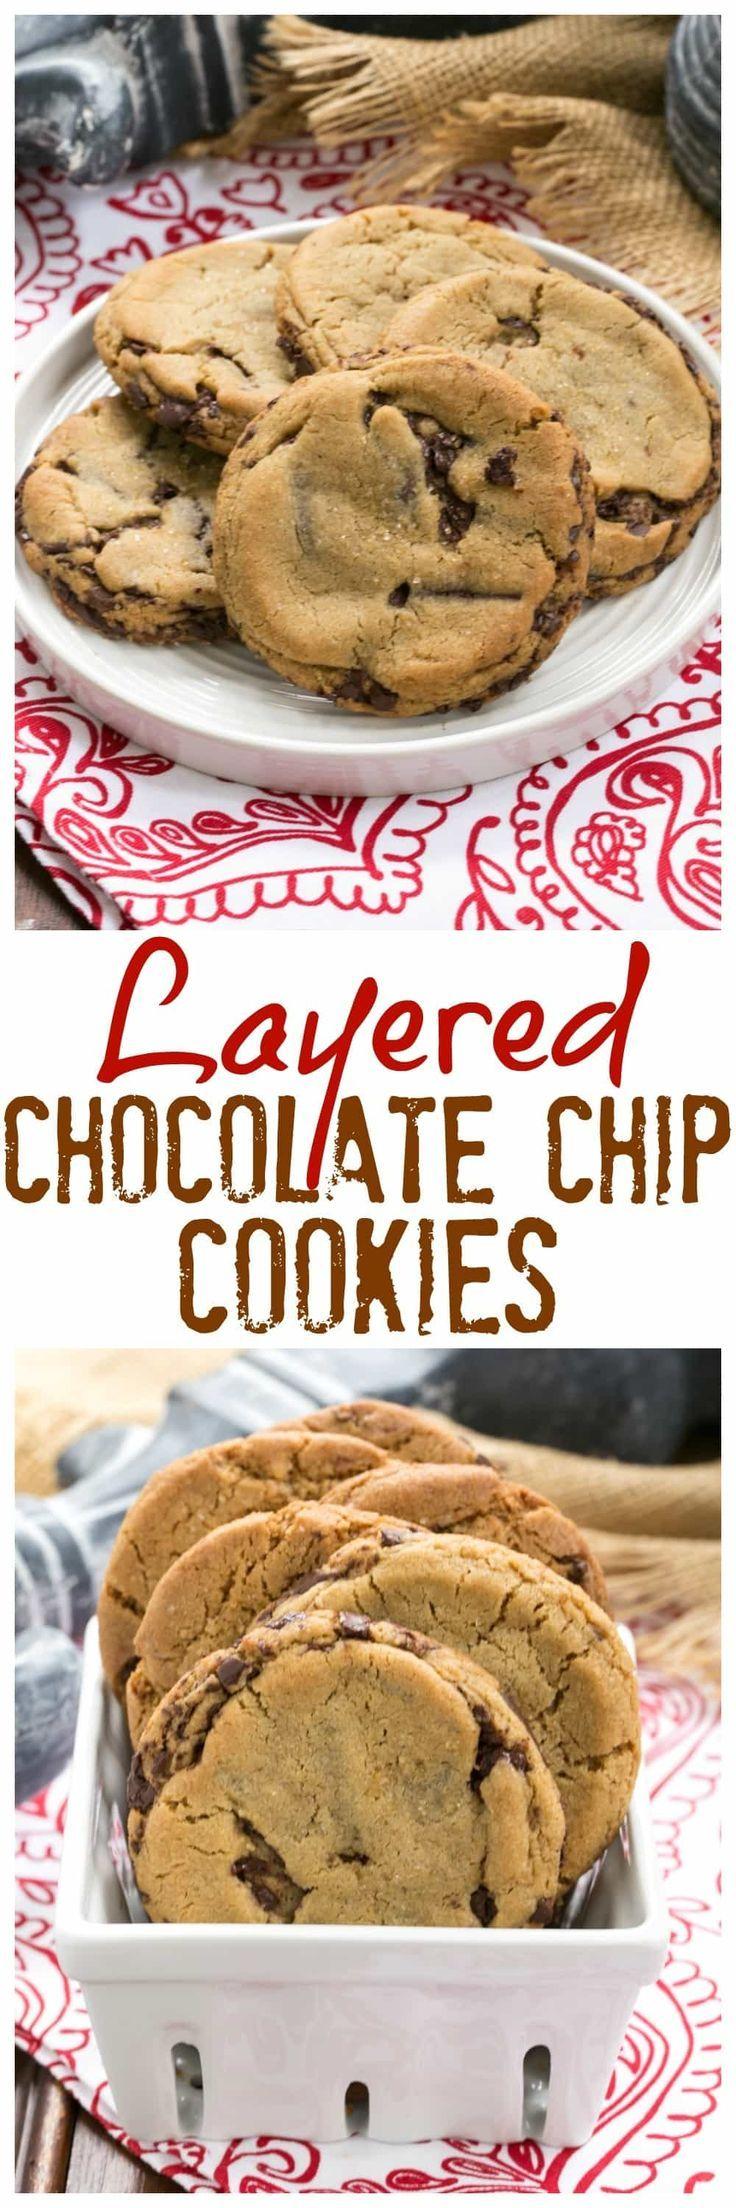 Layered Chocolate Chip Cookies | Dark Brown sugar and layers of bittersweet chocolate shards make these a one of a kind chocolate chip cookie! @lizzydo